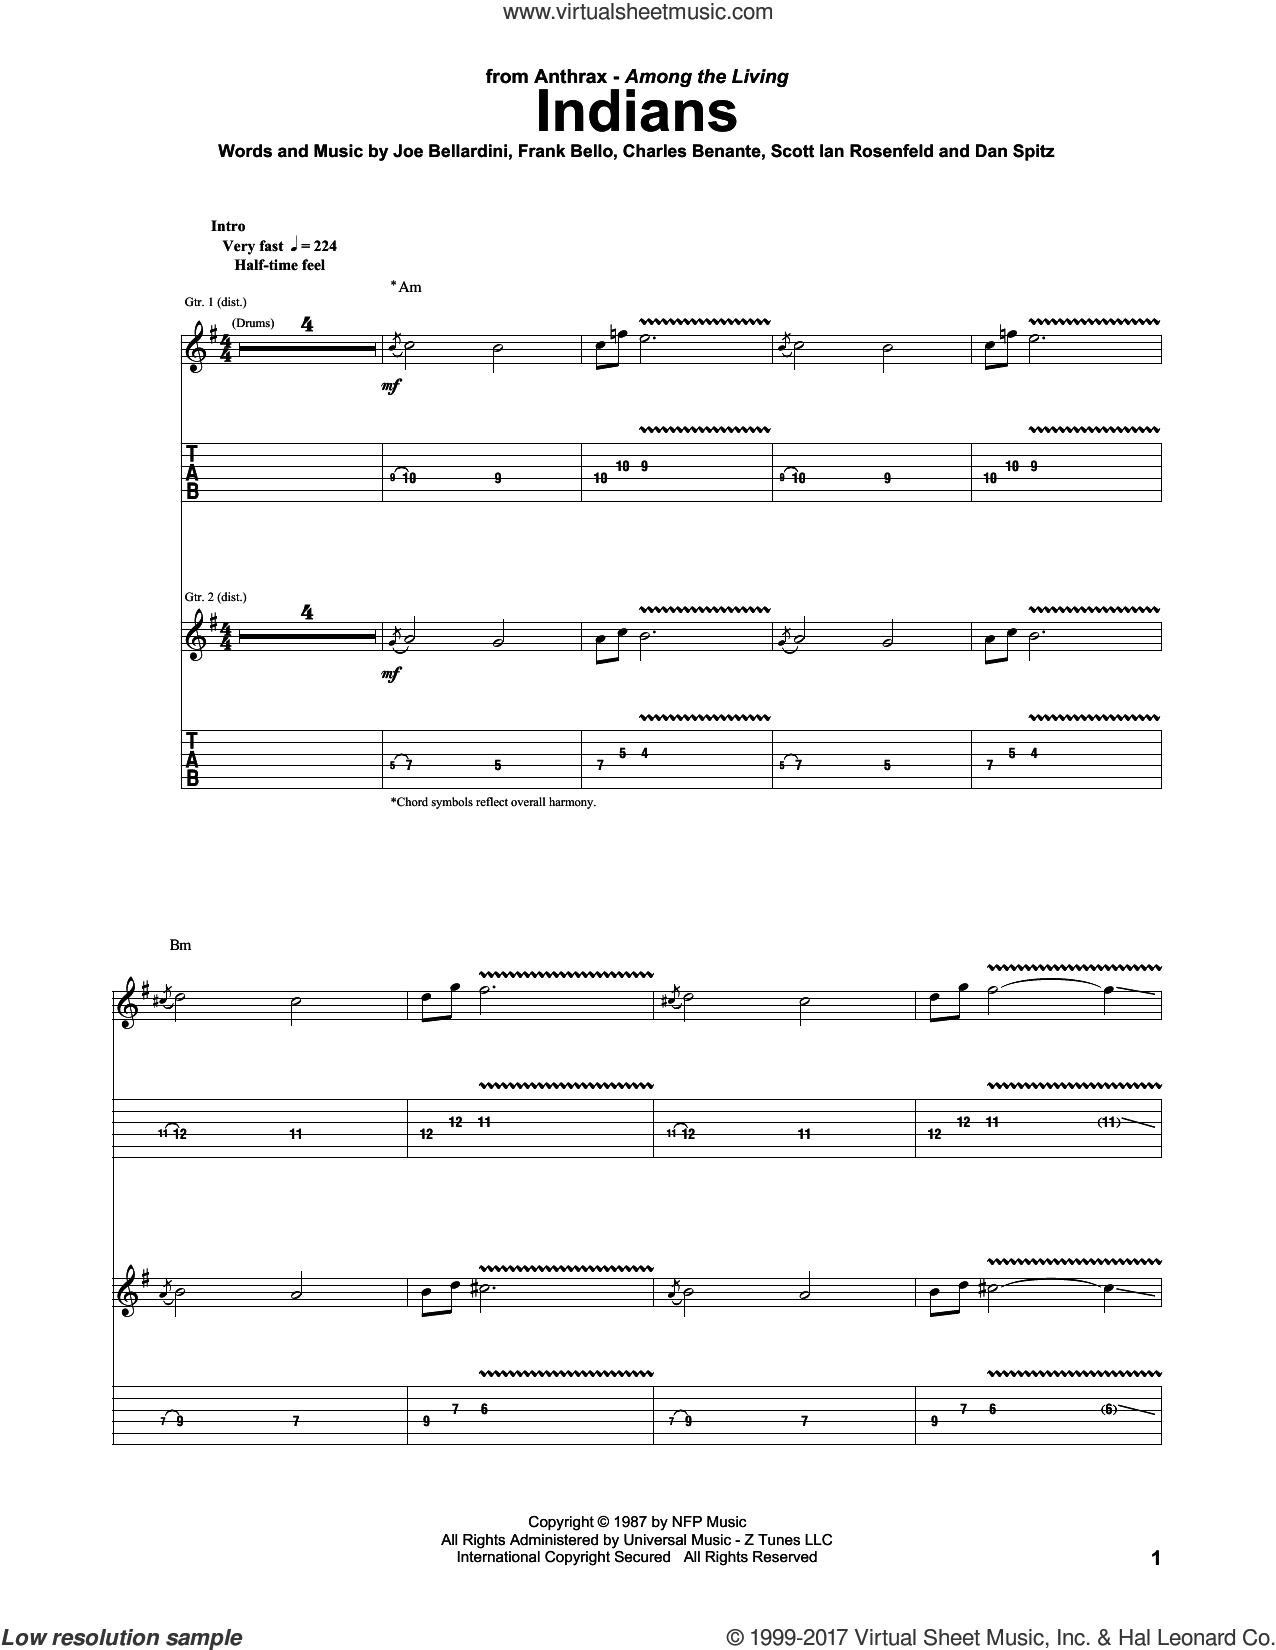 Indians sheet music for guitar (tablature) by Anthrax, Charles Benante, Dan Spitz, Frank Bello, Joe Bellardini and Scott Rosenfeld, intermediate skill level